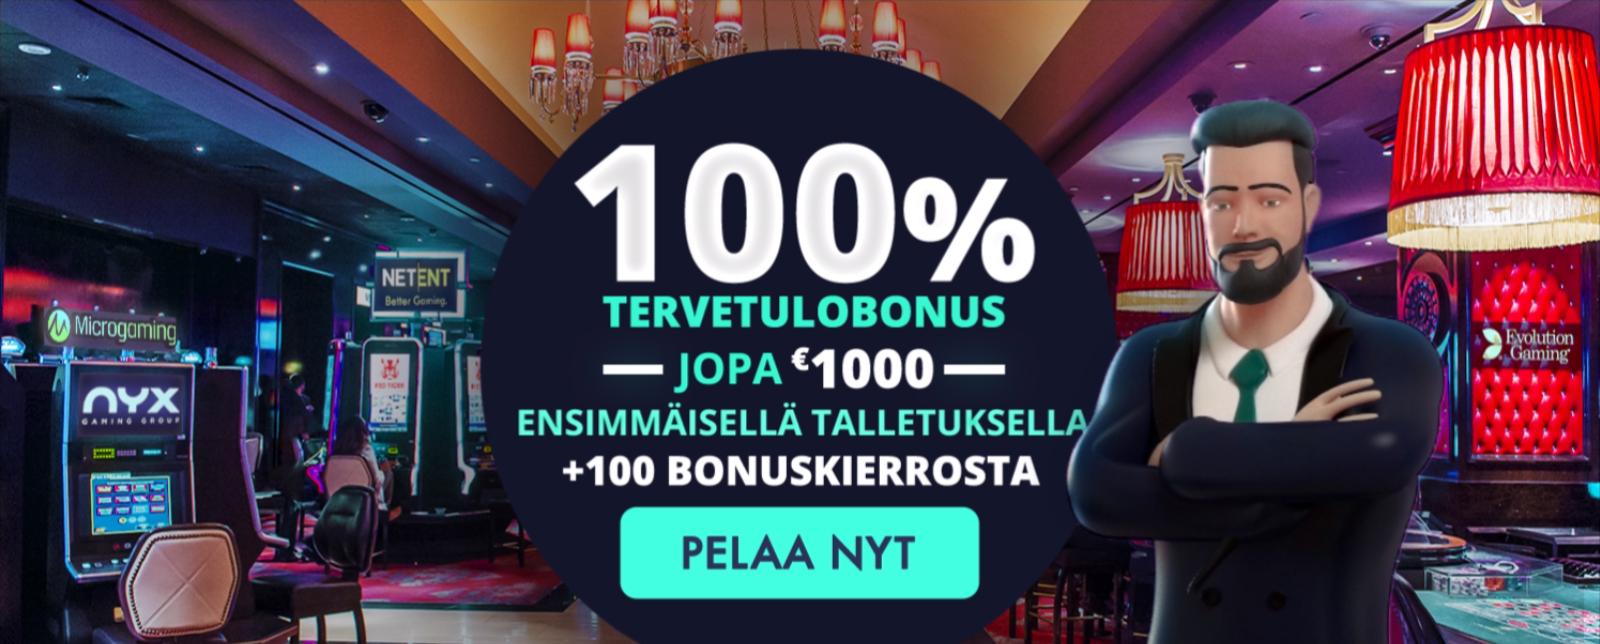 Jonny Jackpot Casino content Images - Finland CasinoTop